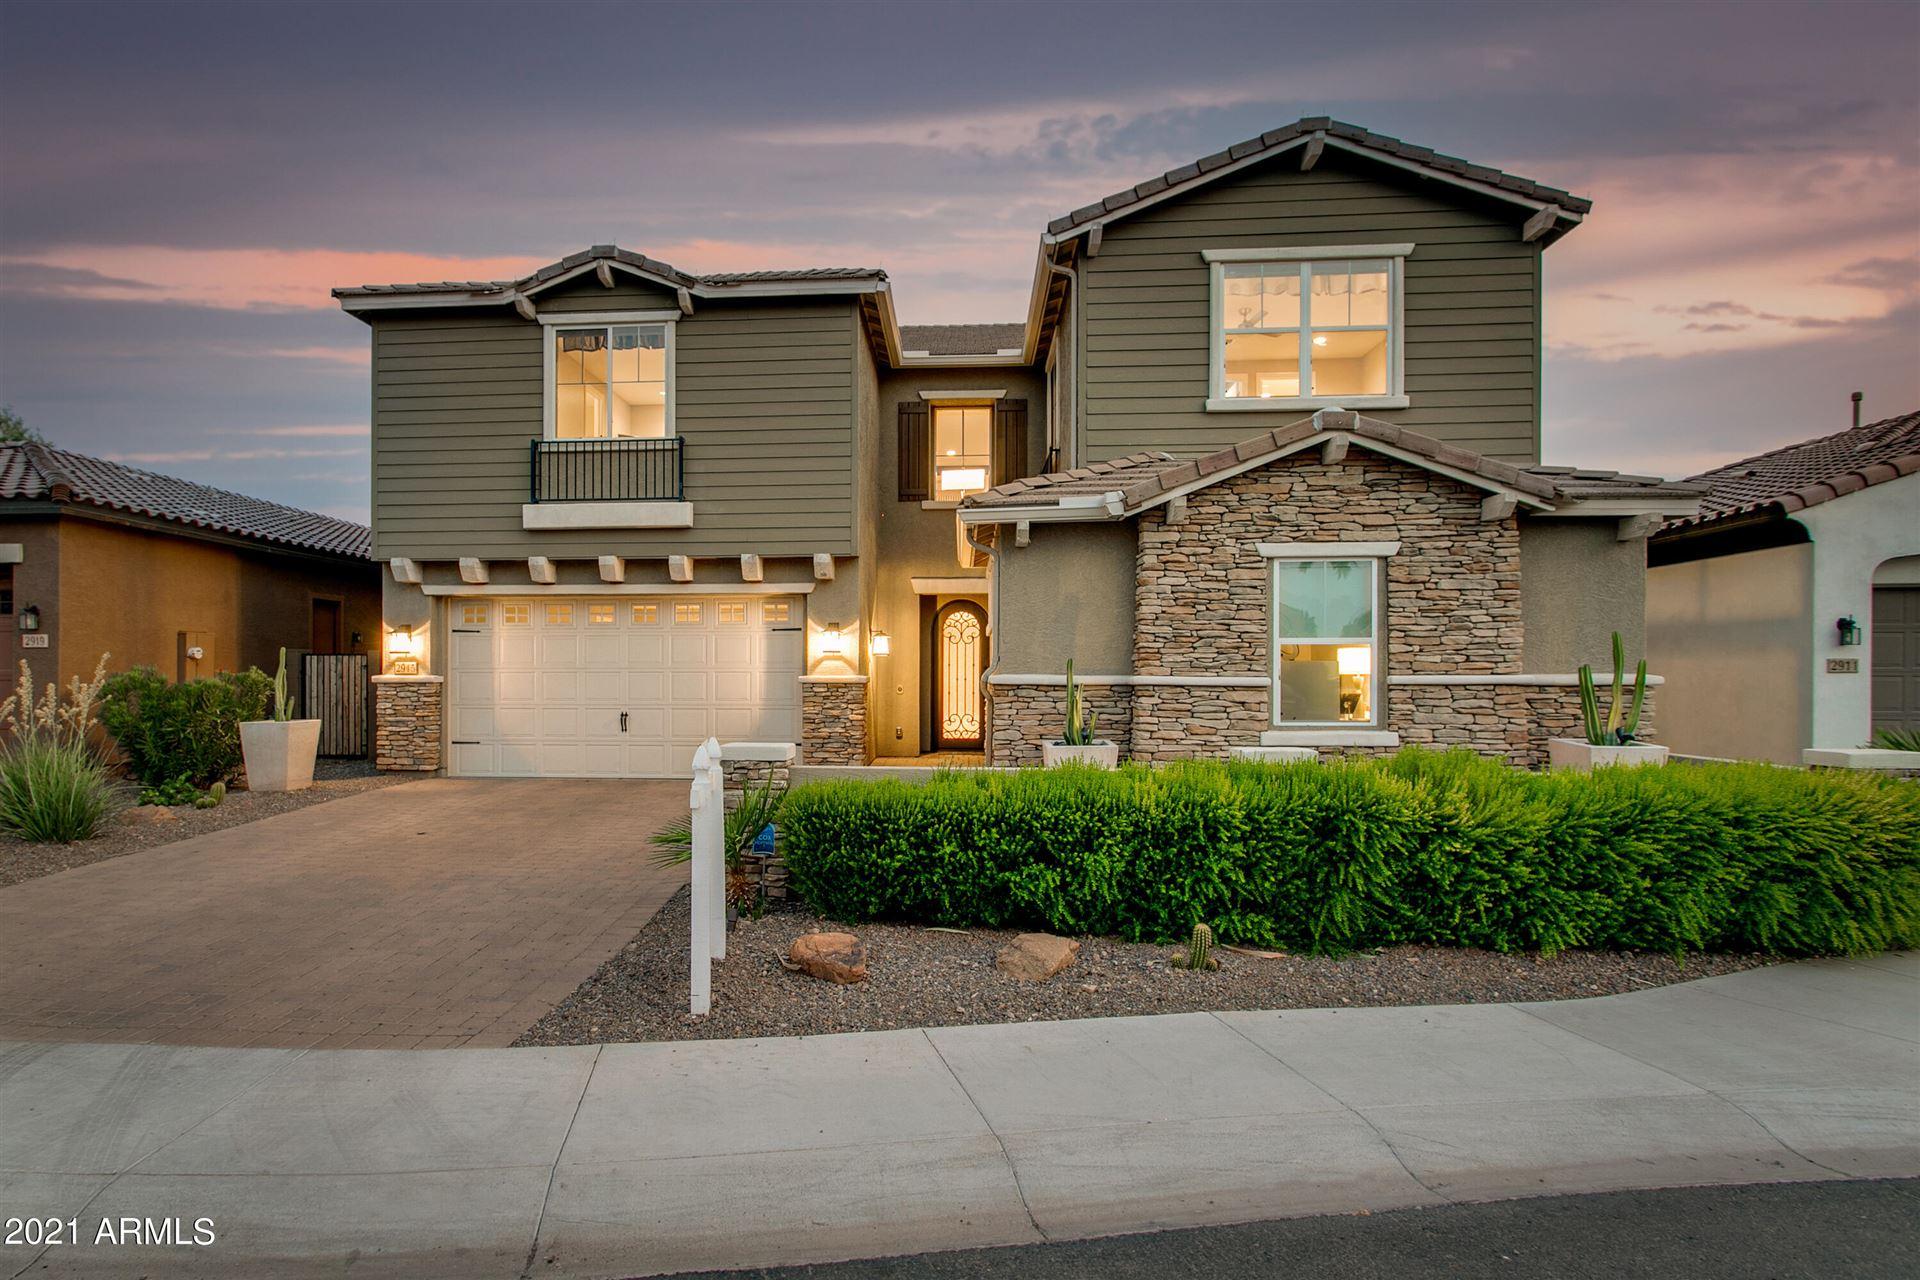 2915 E MADISON VISTAS Drive, Phoenix, AZ 85016 - MLS#: 6261203